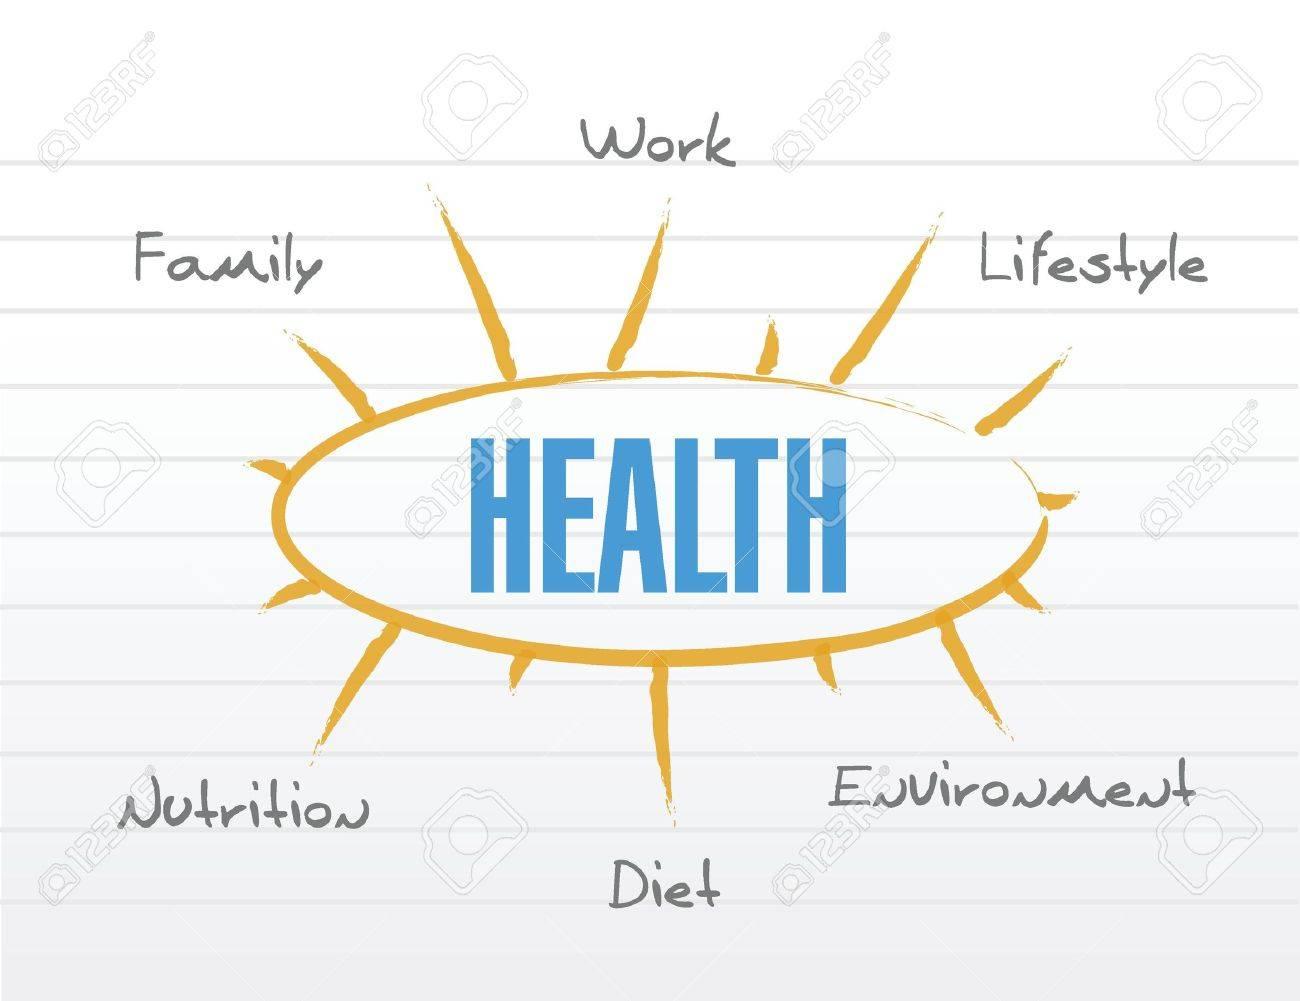 Health Model Diagram List Illustration Design Over A White Background with regard to Model Diagram